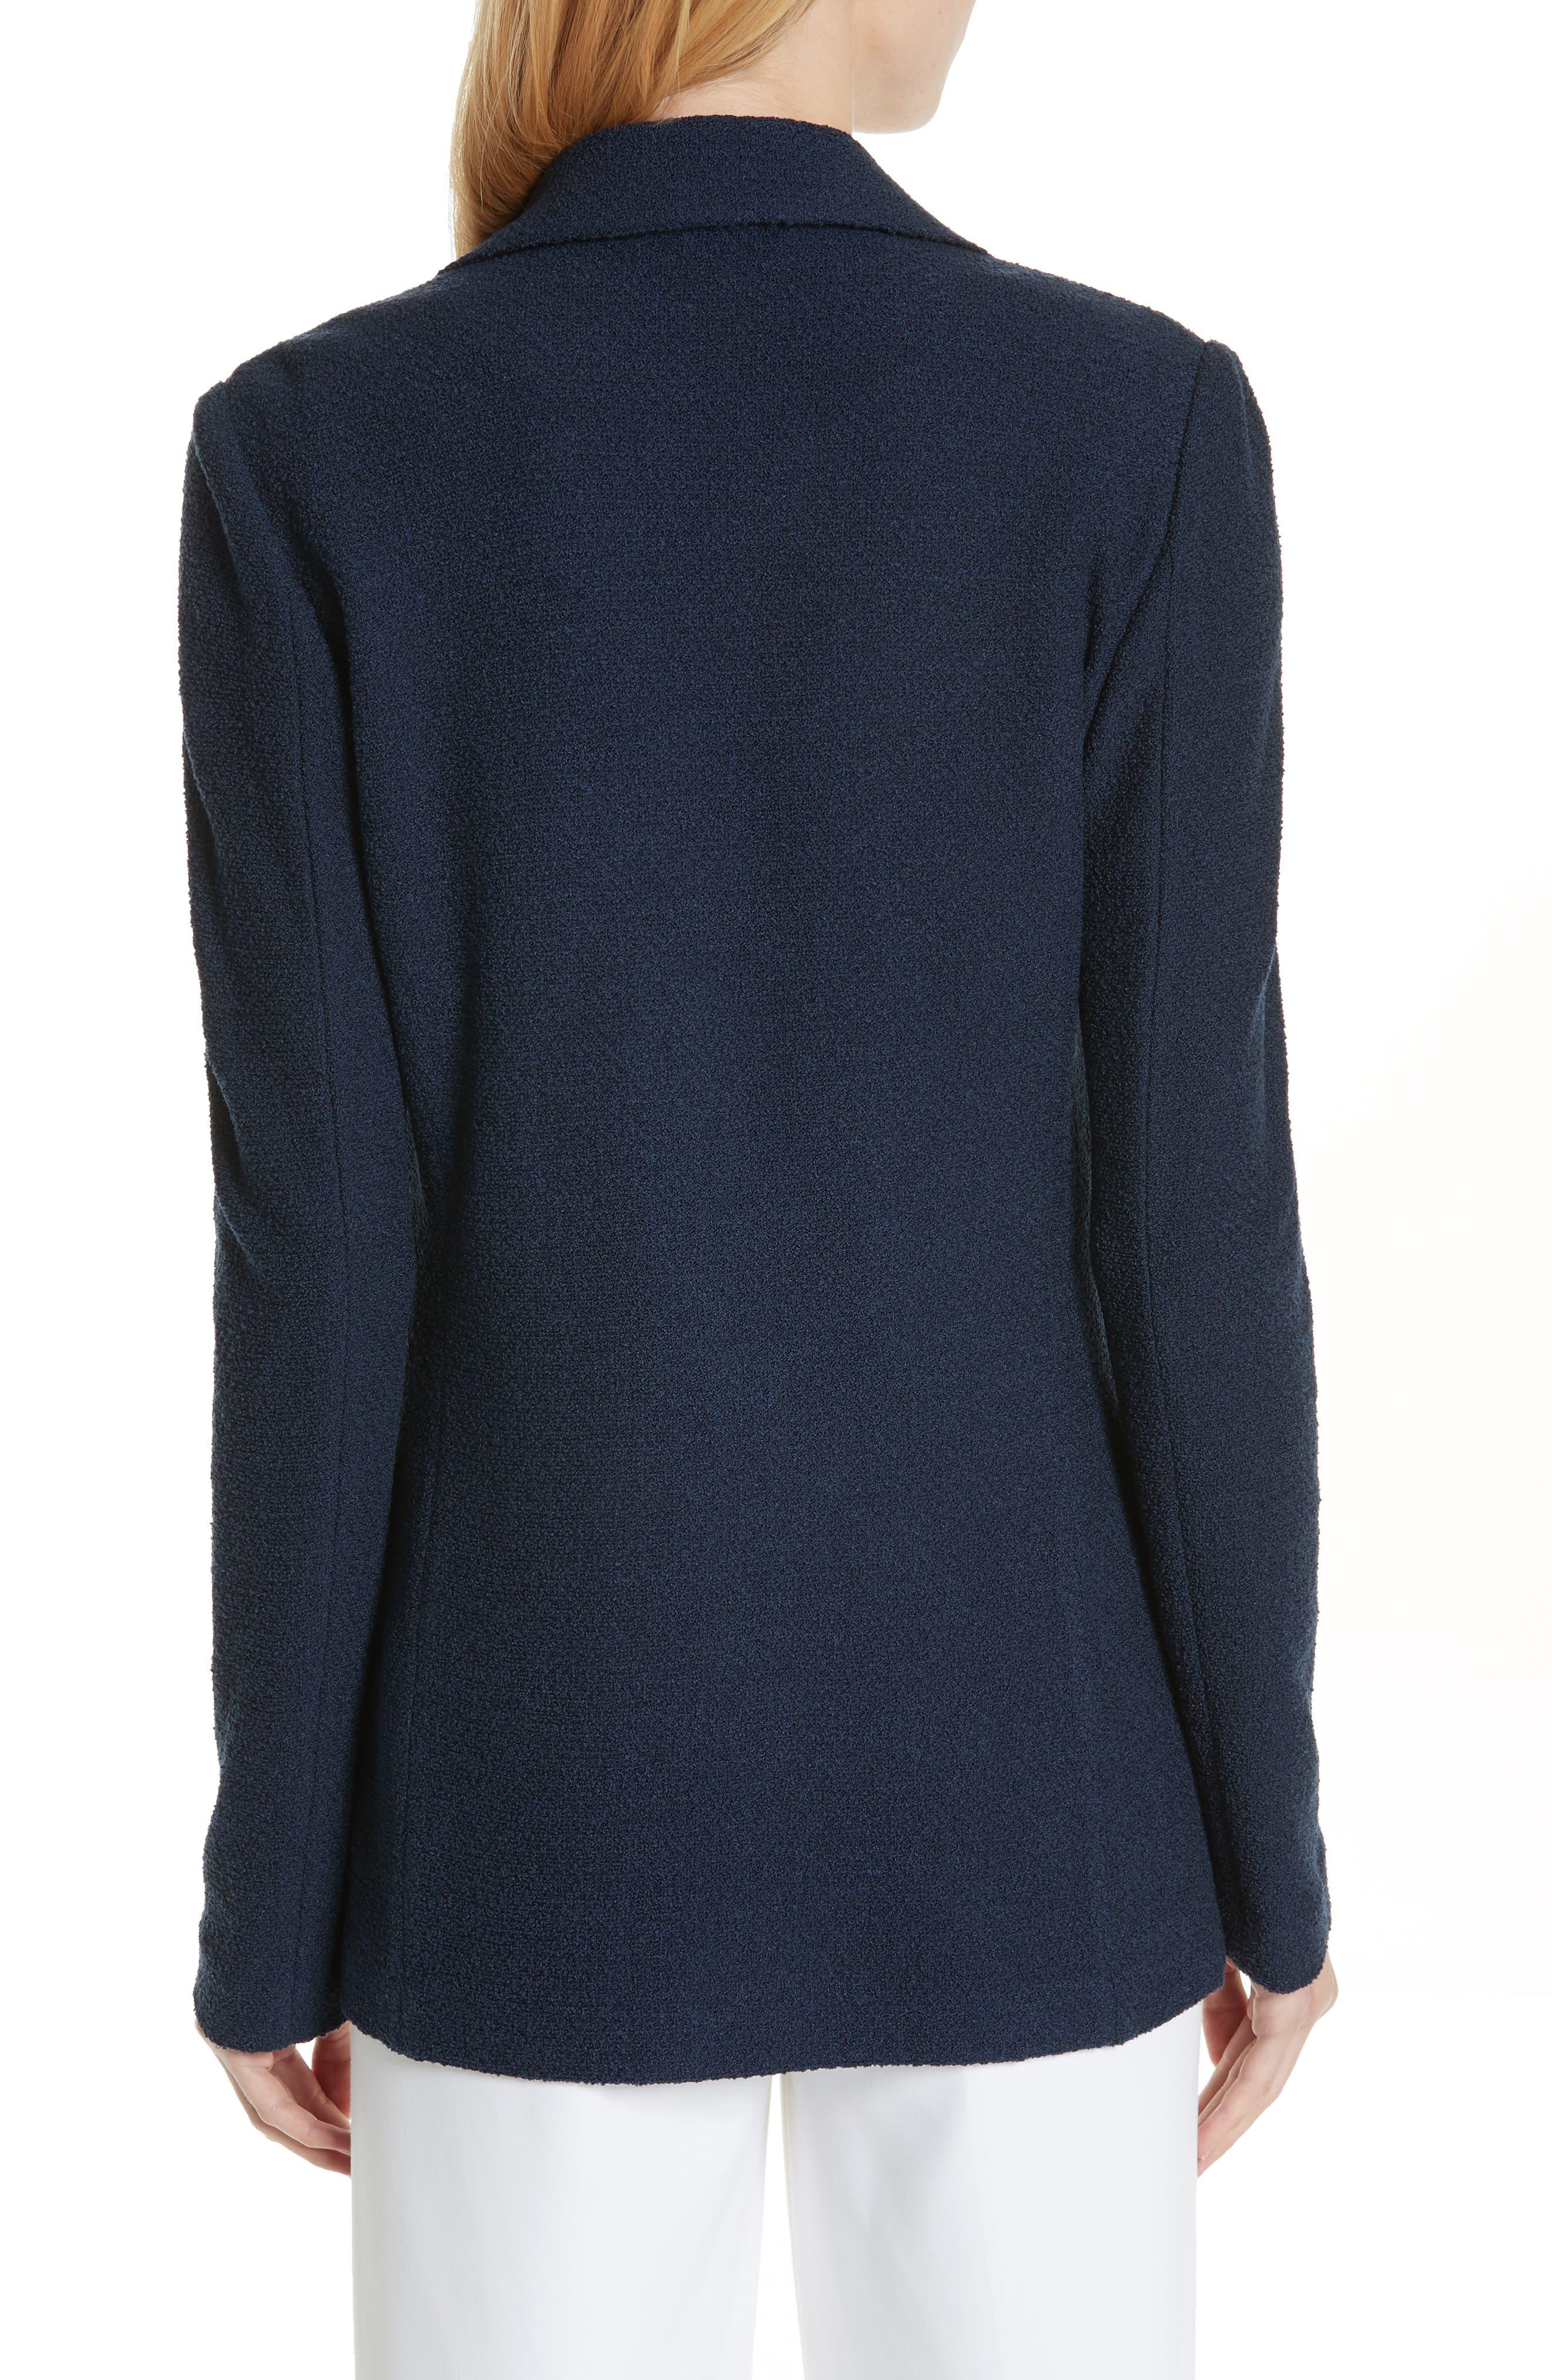 ST. JOHN COLLECTION, Ana Bouclé Knit Blazer, Alternate thumbnail 2, color, DEEP BLUE